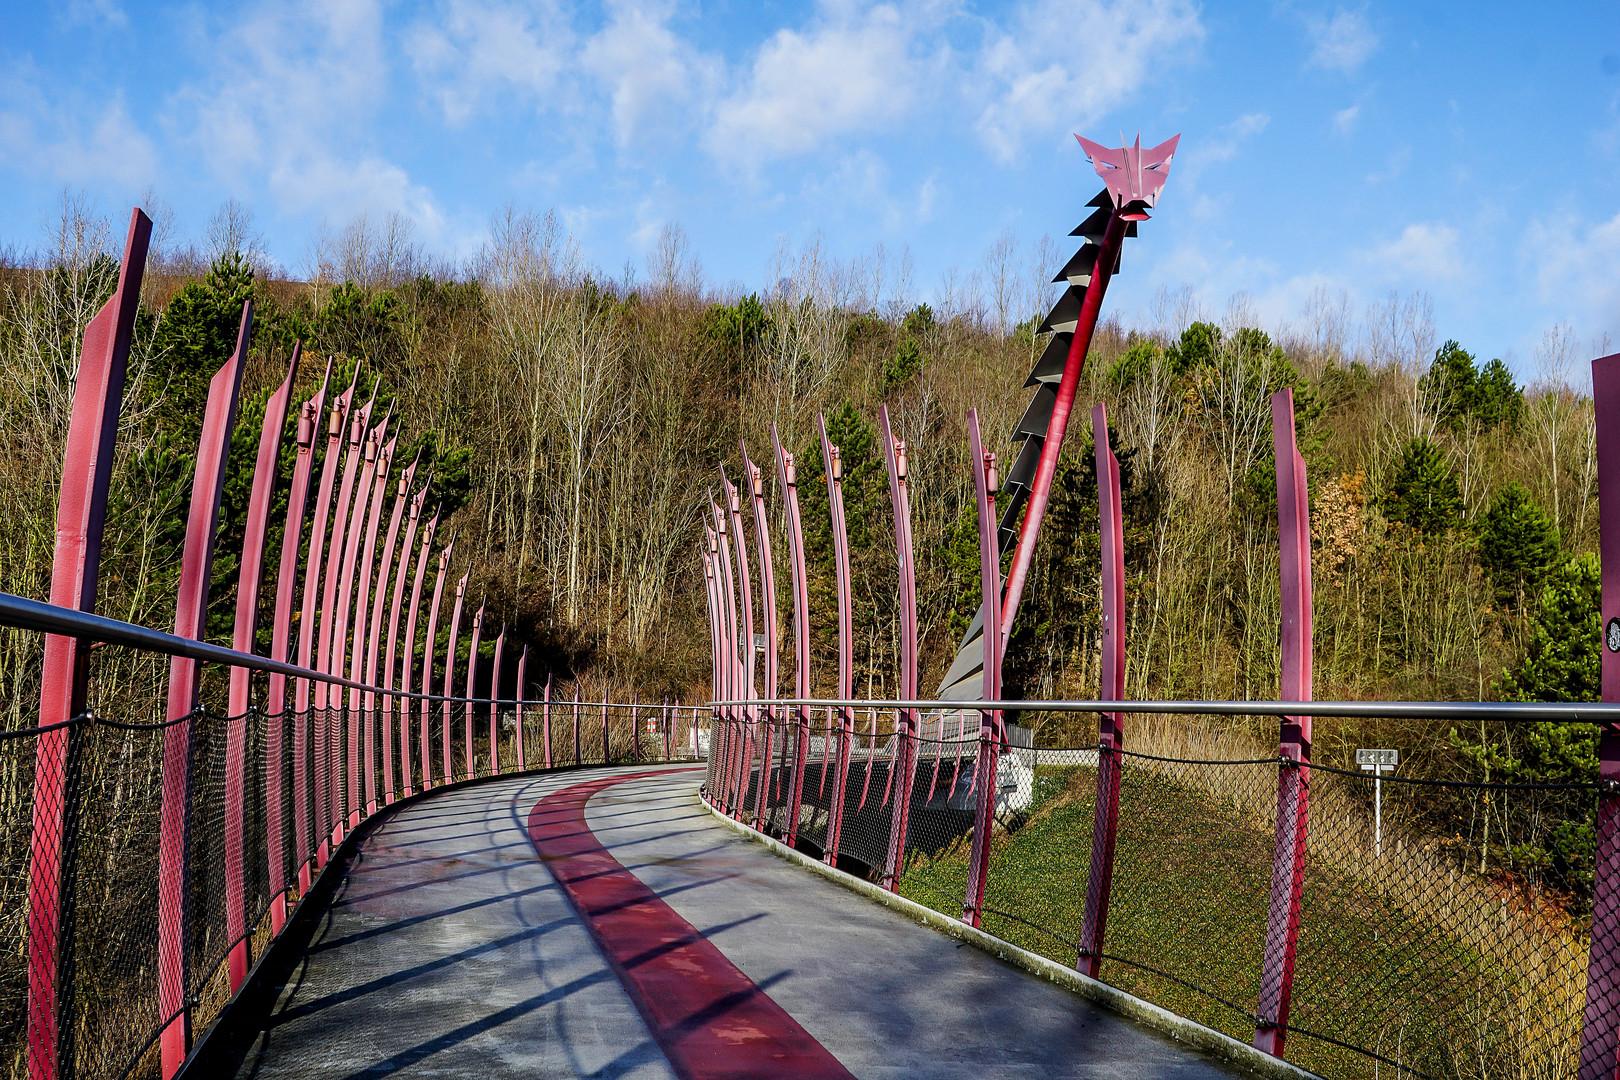 Drachenbrücke Recklinghausen (1)